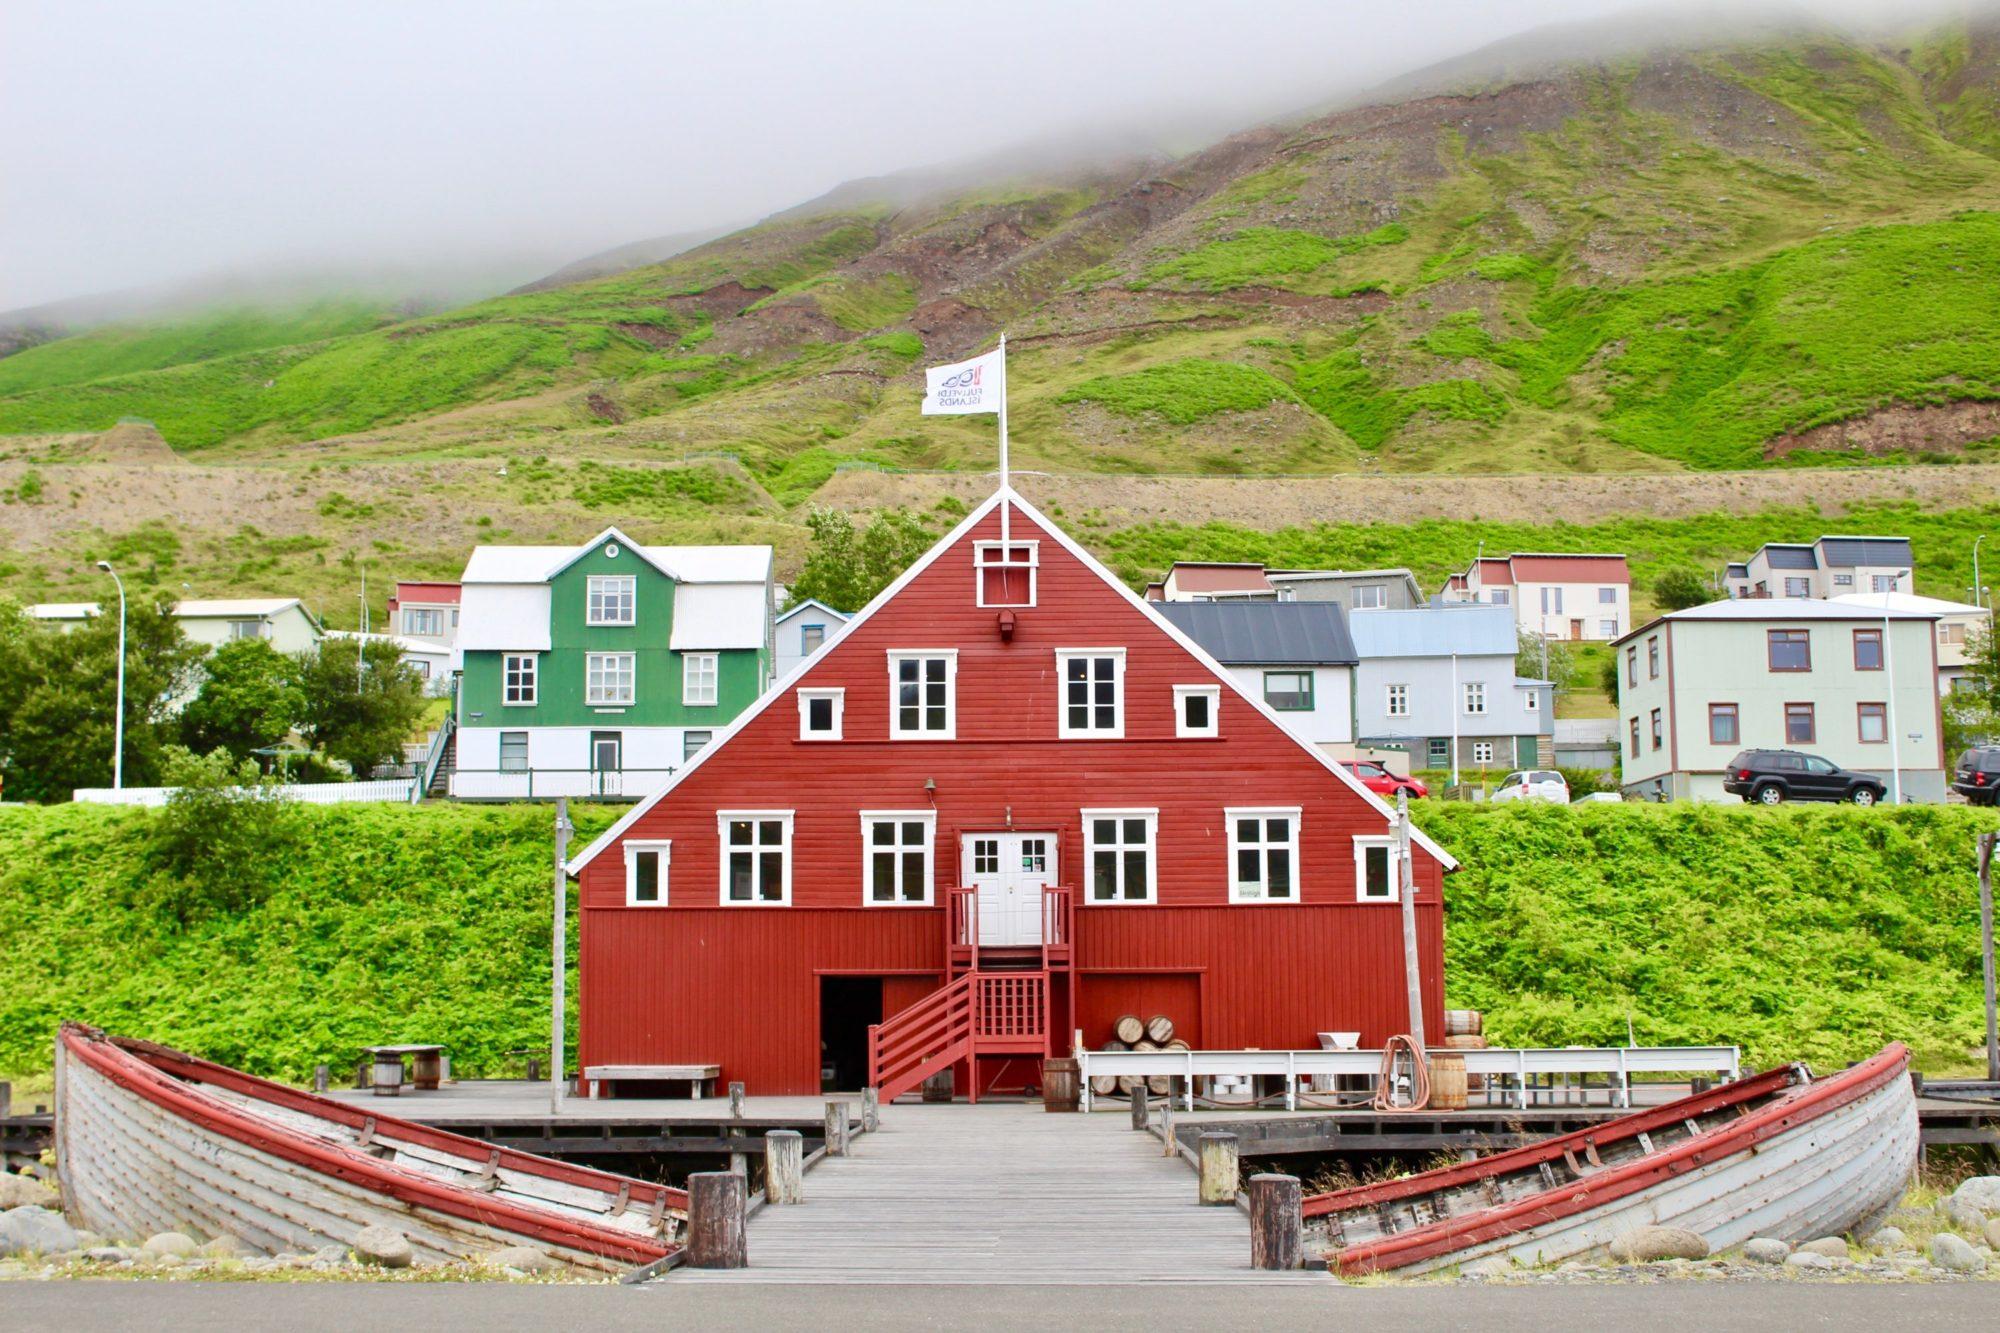 IMG 1133 e1535705732528 ICELAND ROAD TRIP